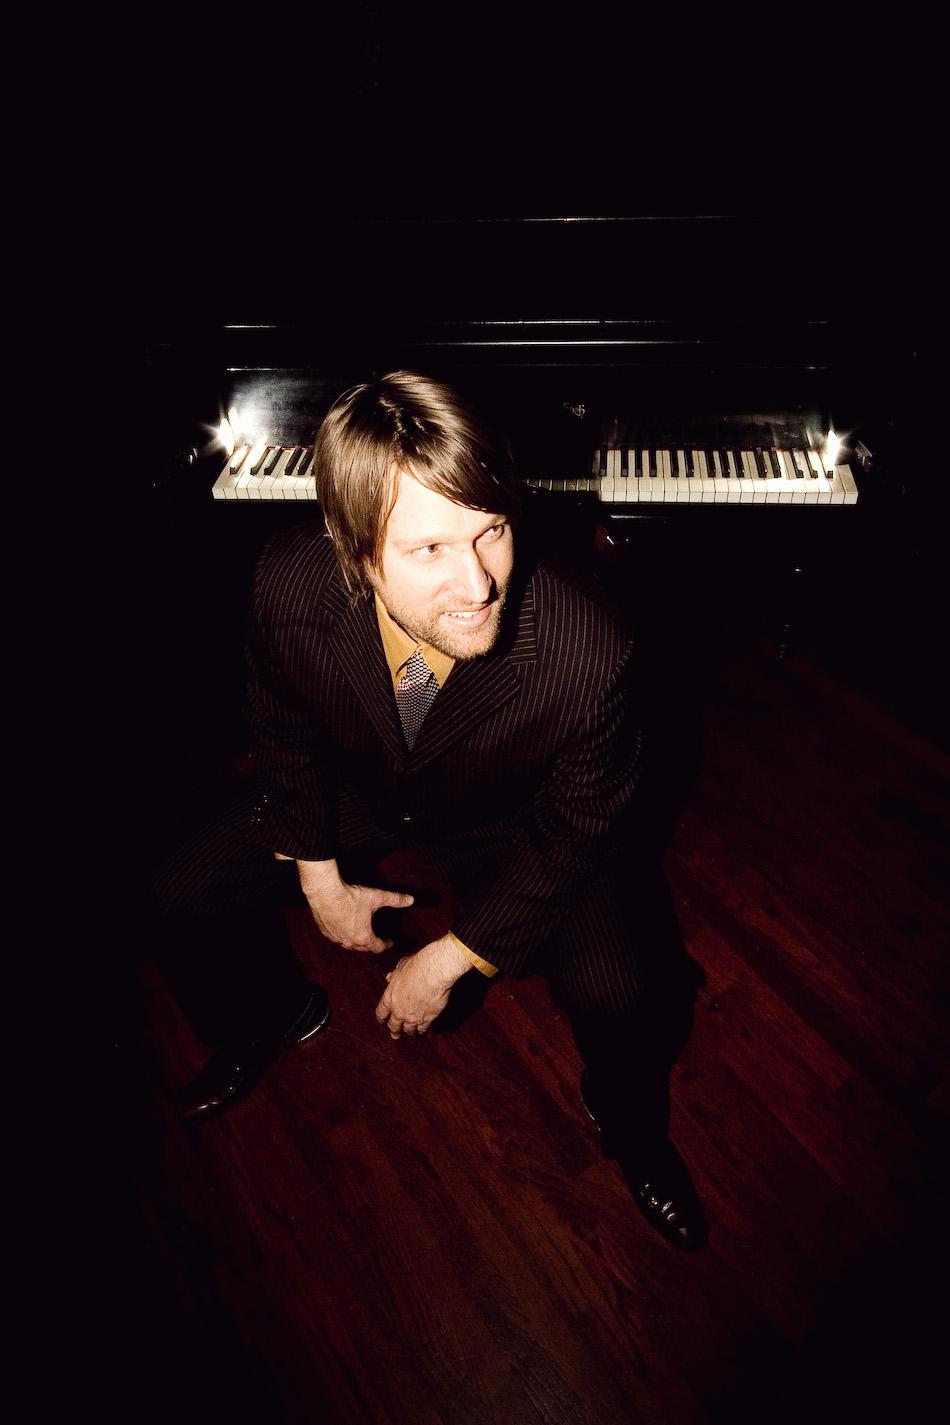 kingham piano arial.jpg